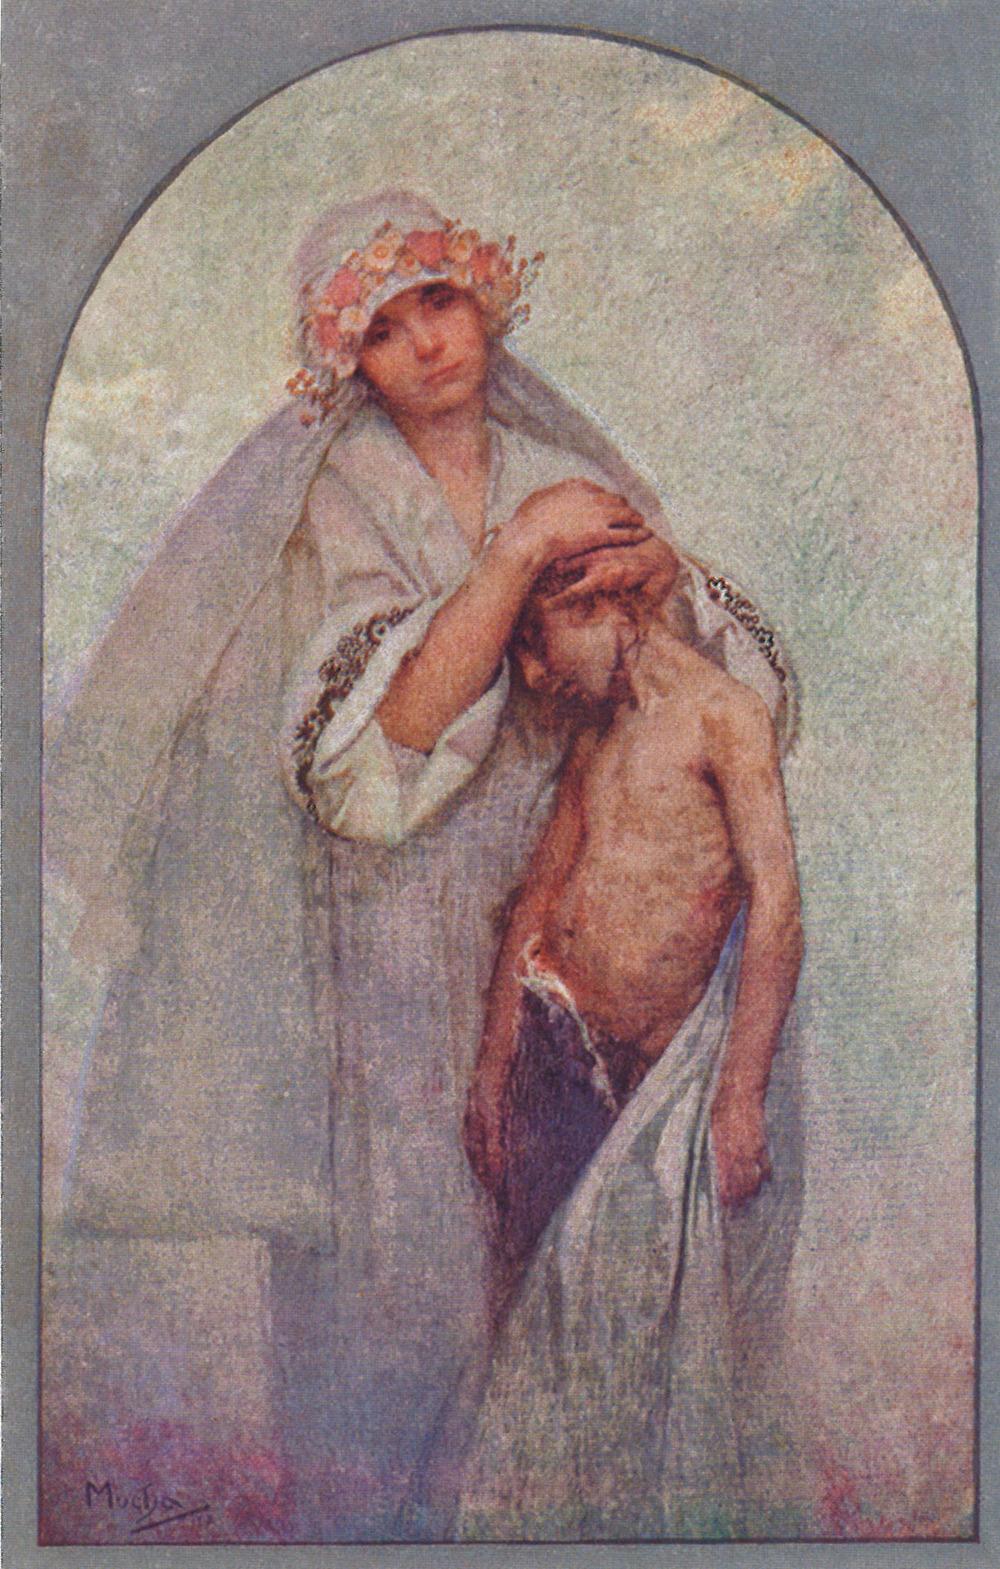 Alphonse Mucha (1860-1939). Bohemian Heart Charity. Prague, Czechoslovakia. 1912.